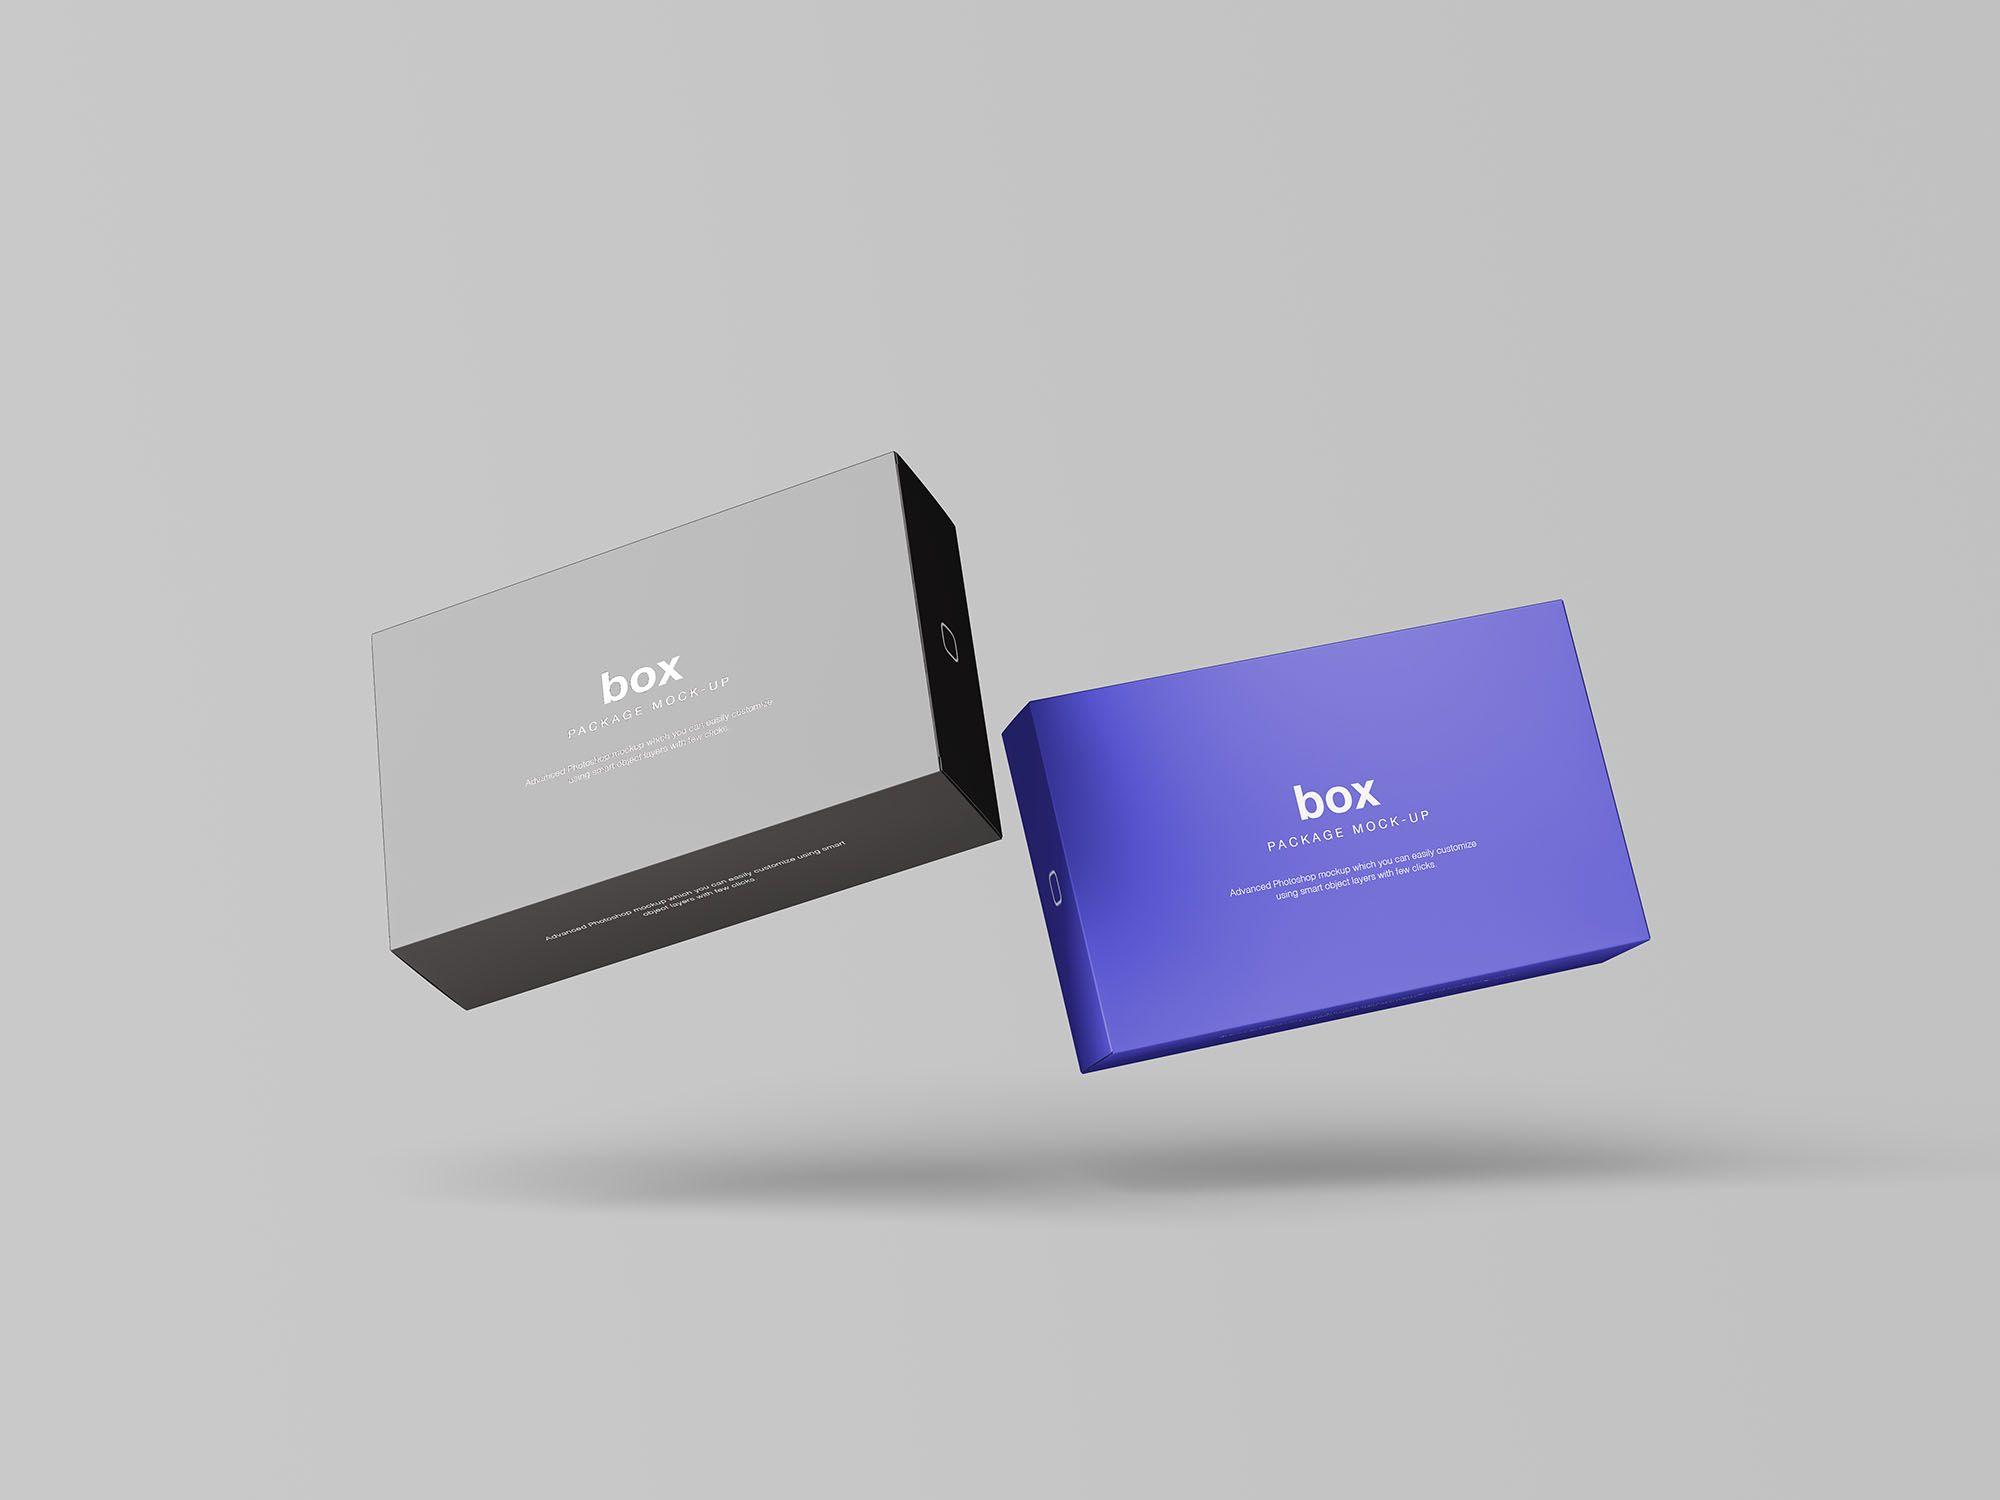 Download Box Packaging Mockup